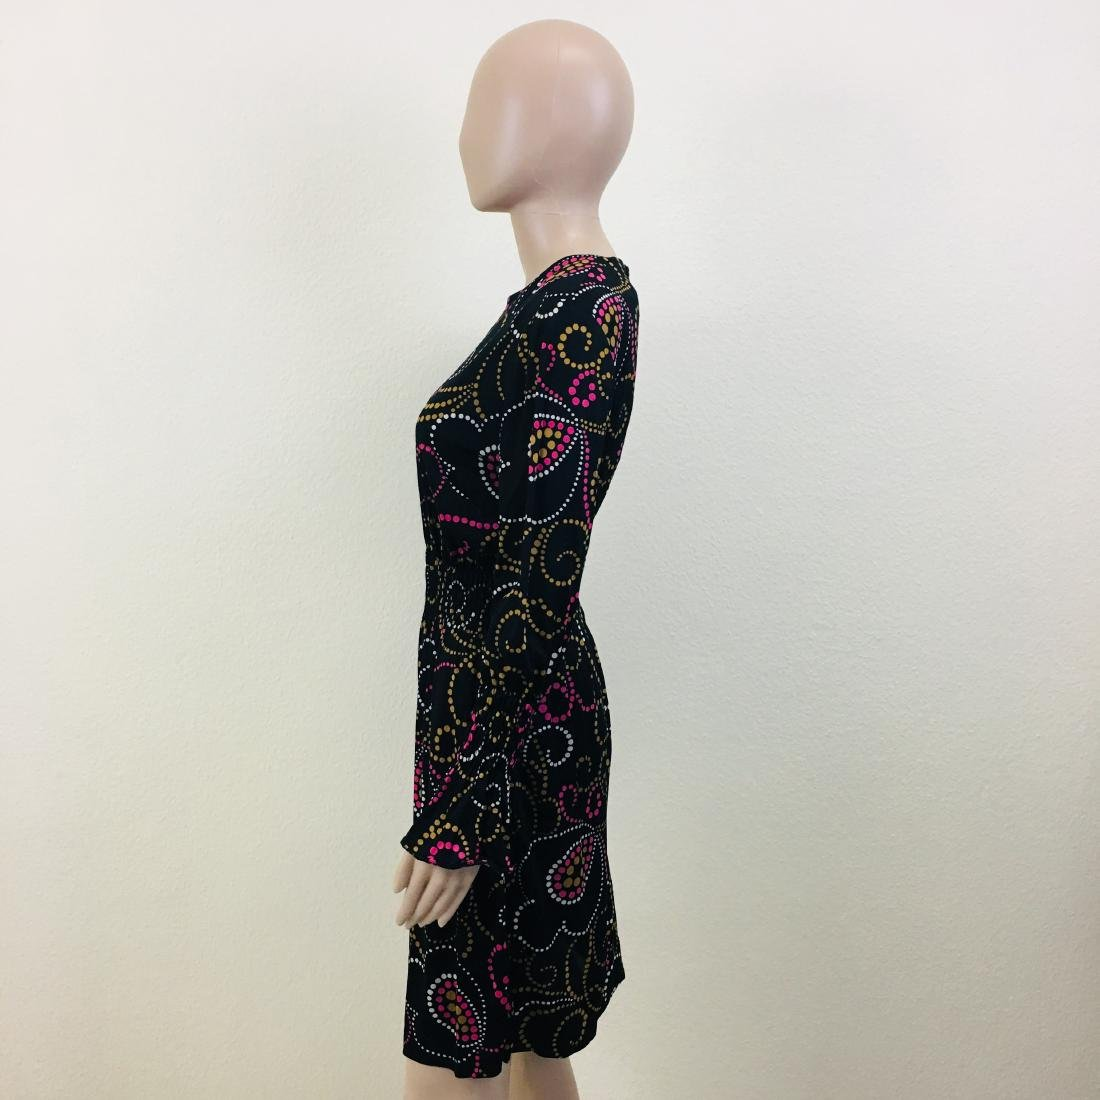 Vintage Women's Black Dress - 6